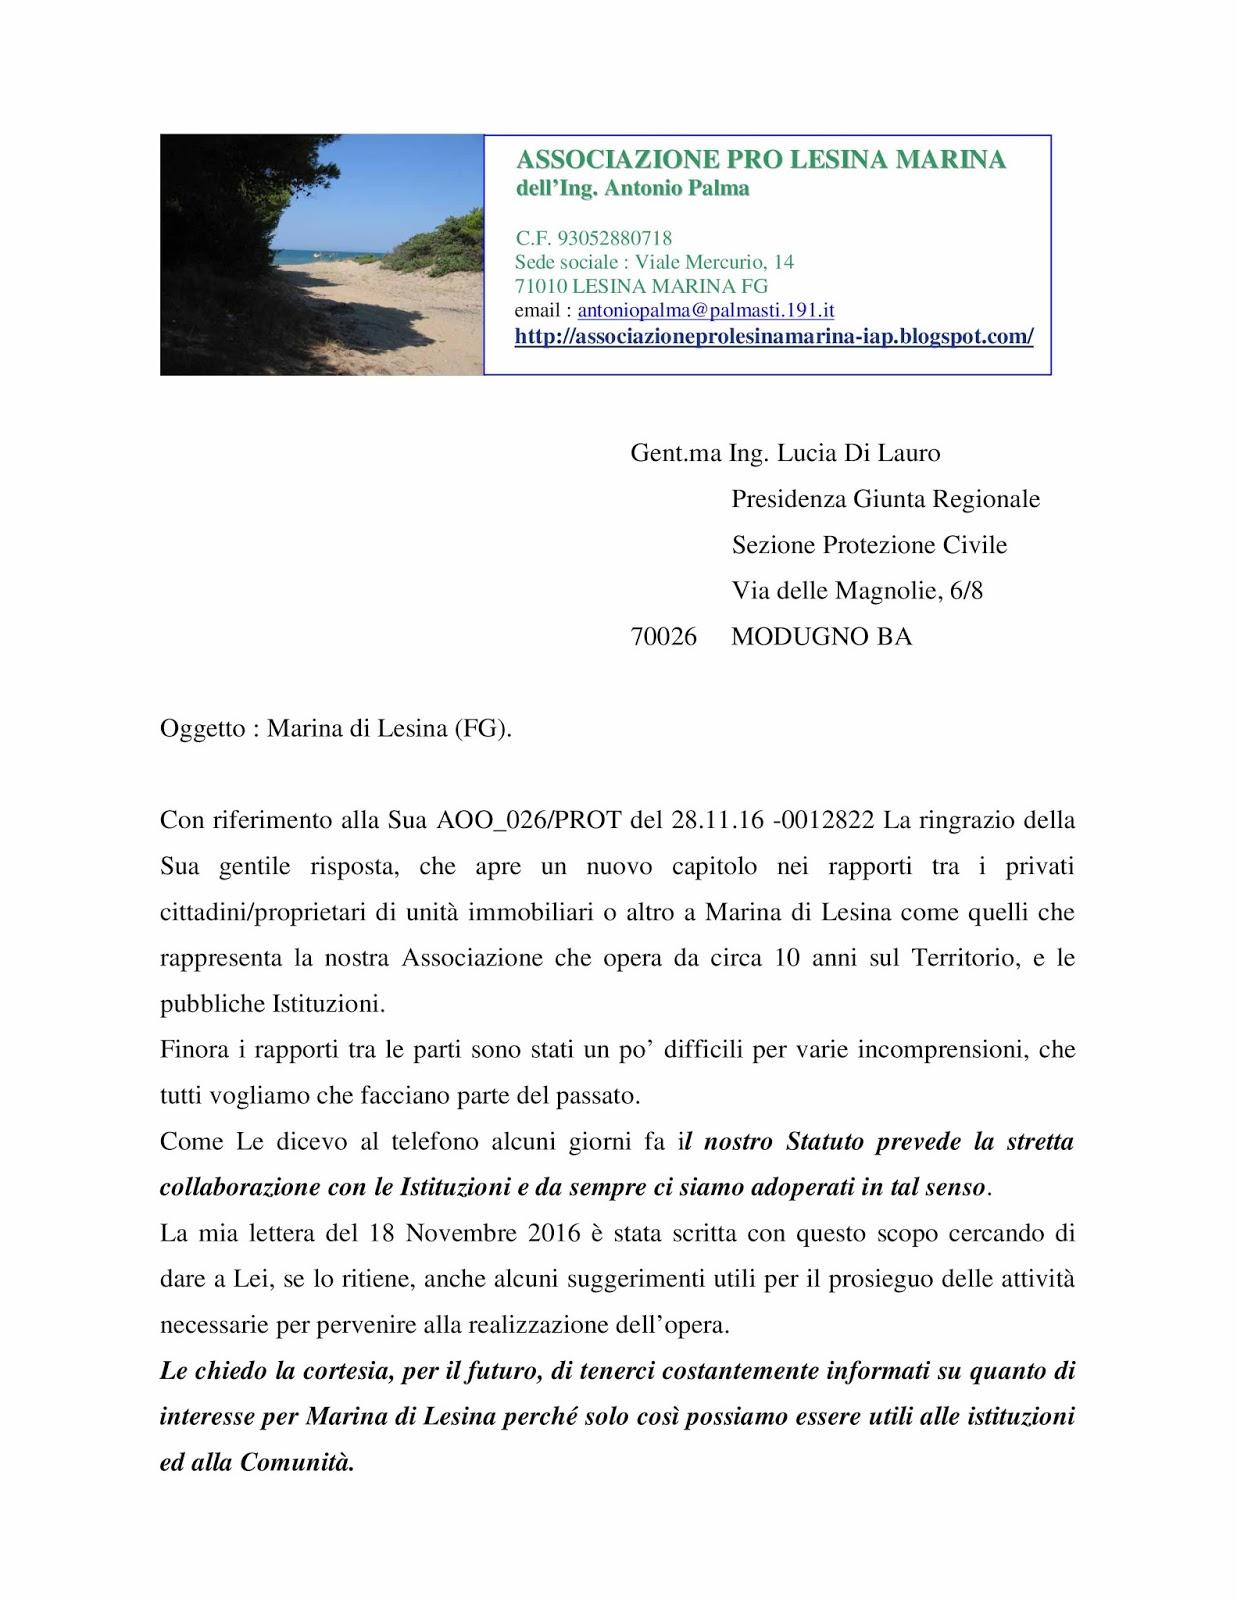 Associazione pro lesina marina dell 39 ing antonio palma - Antonio palma ...